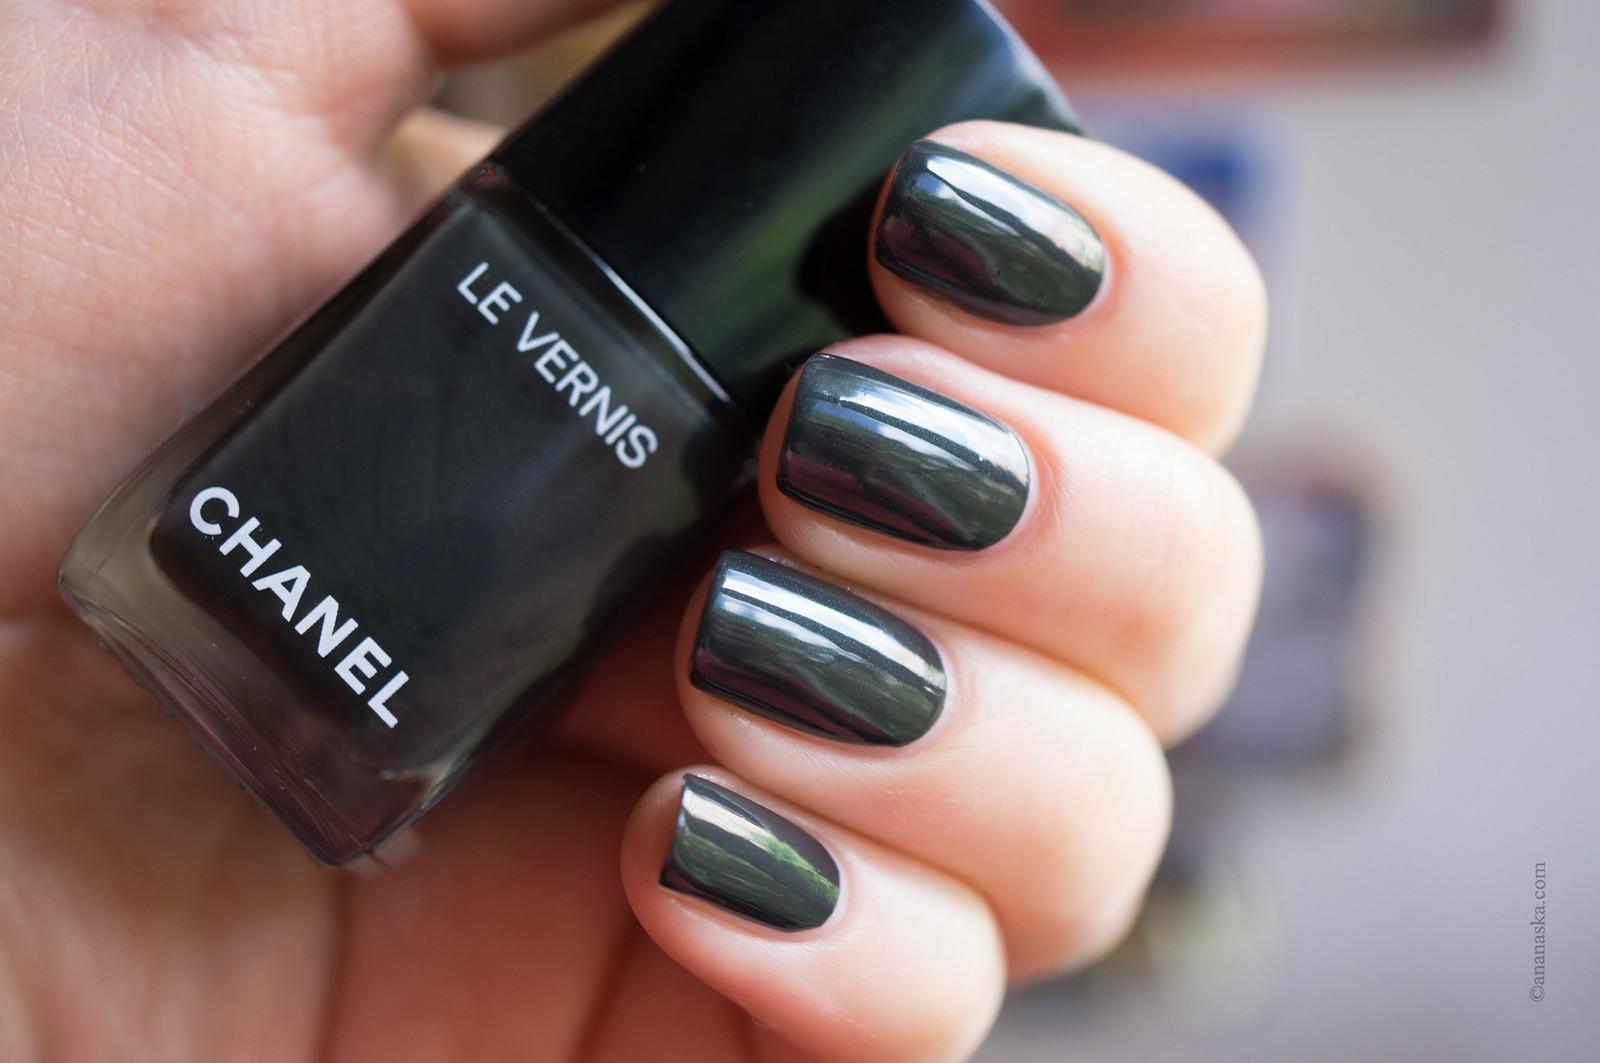 Chanel Le Vernis 558 Sargasso